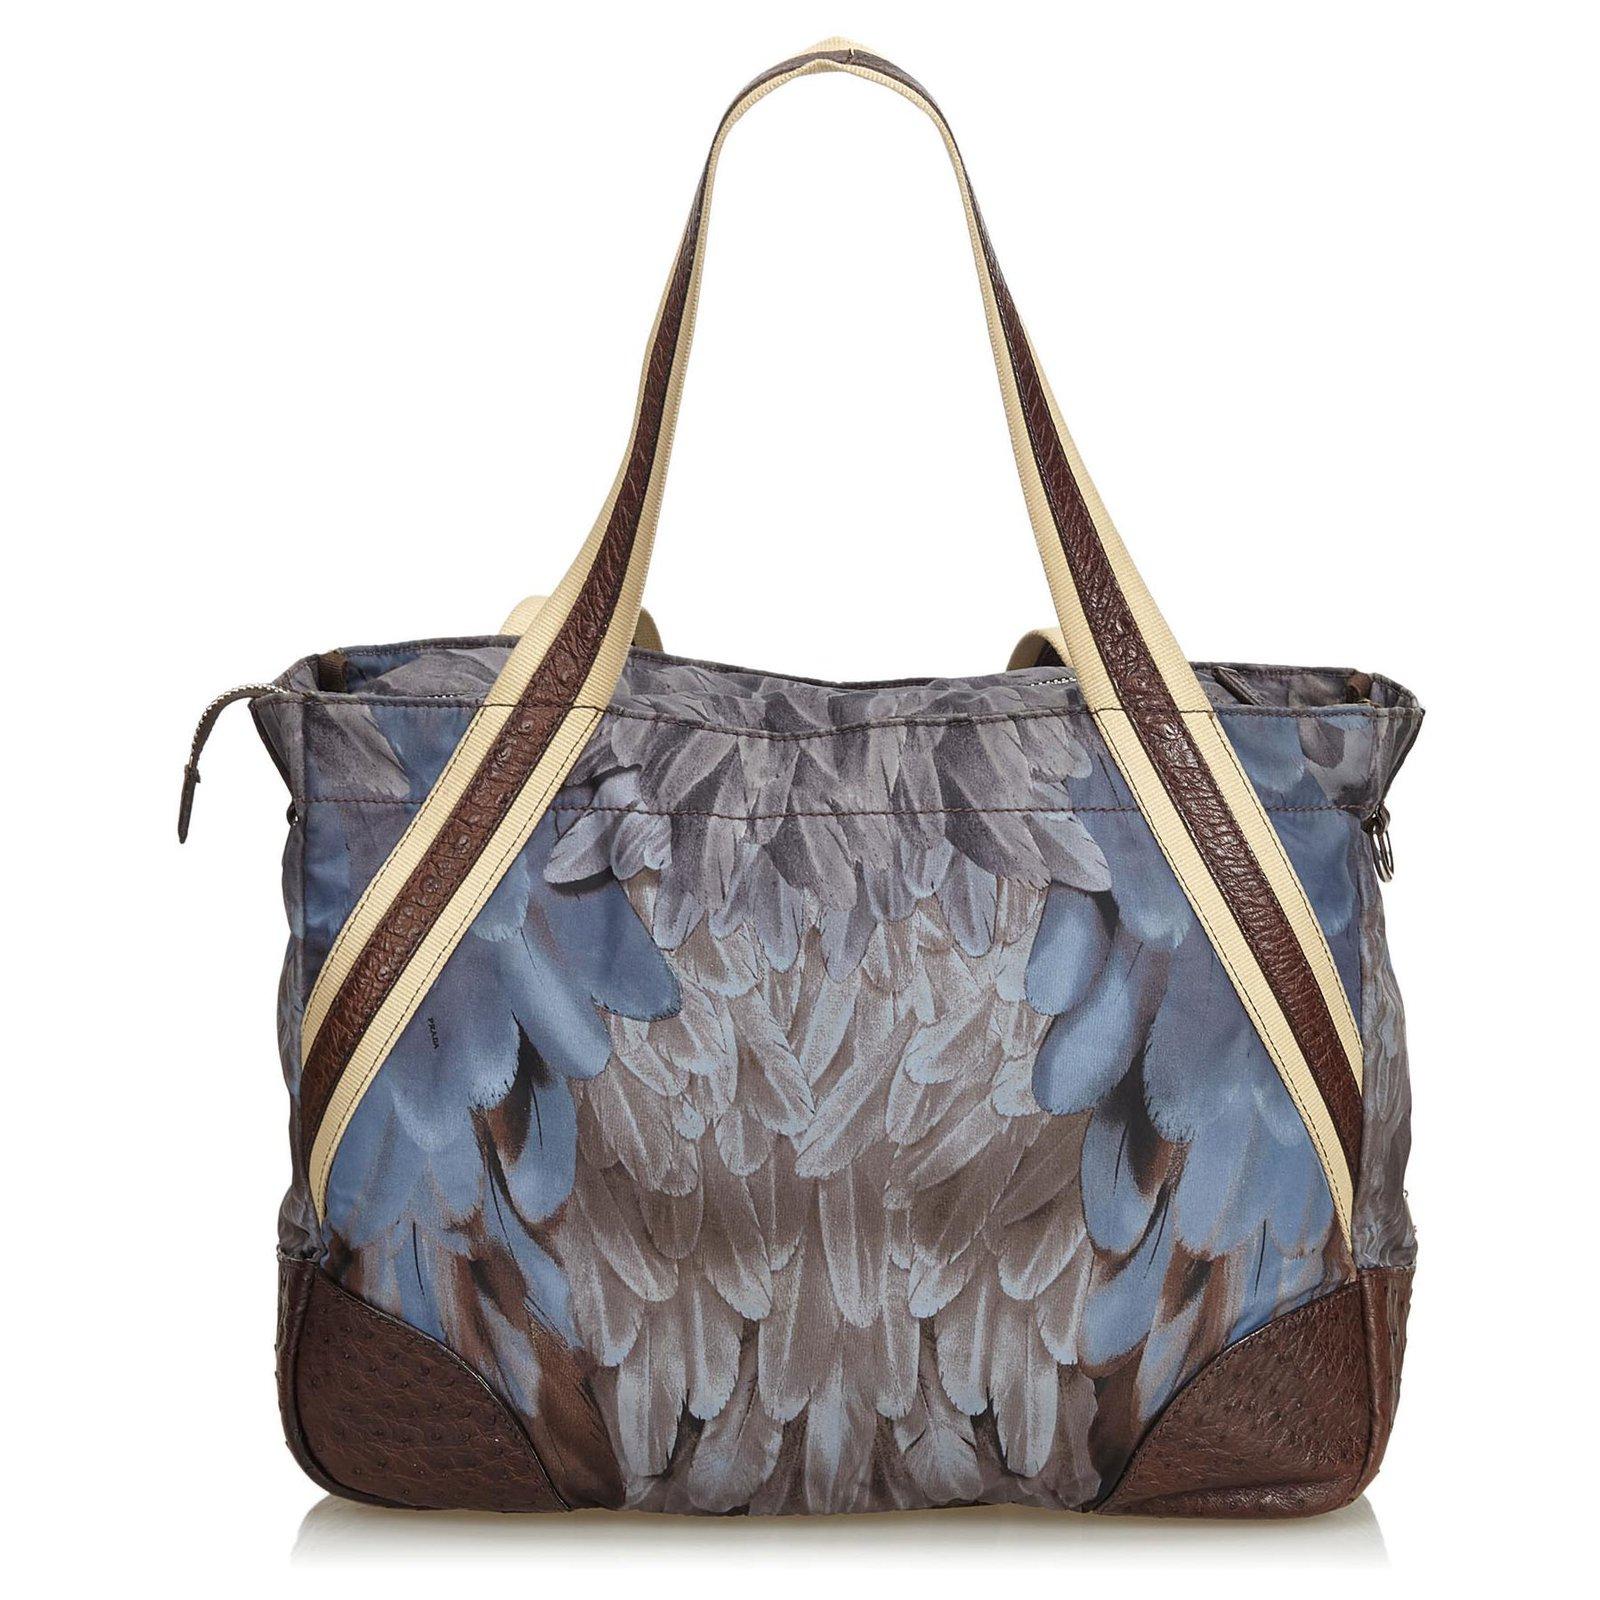 39e238b340cf Prada Prada Blue Printed Nylon Weekender Travel bag Leather,Other ...